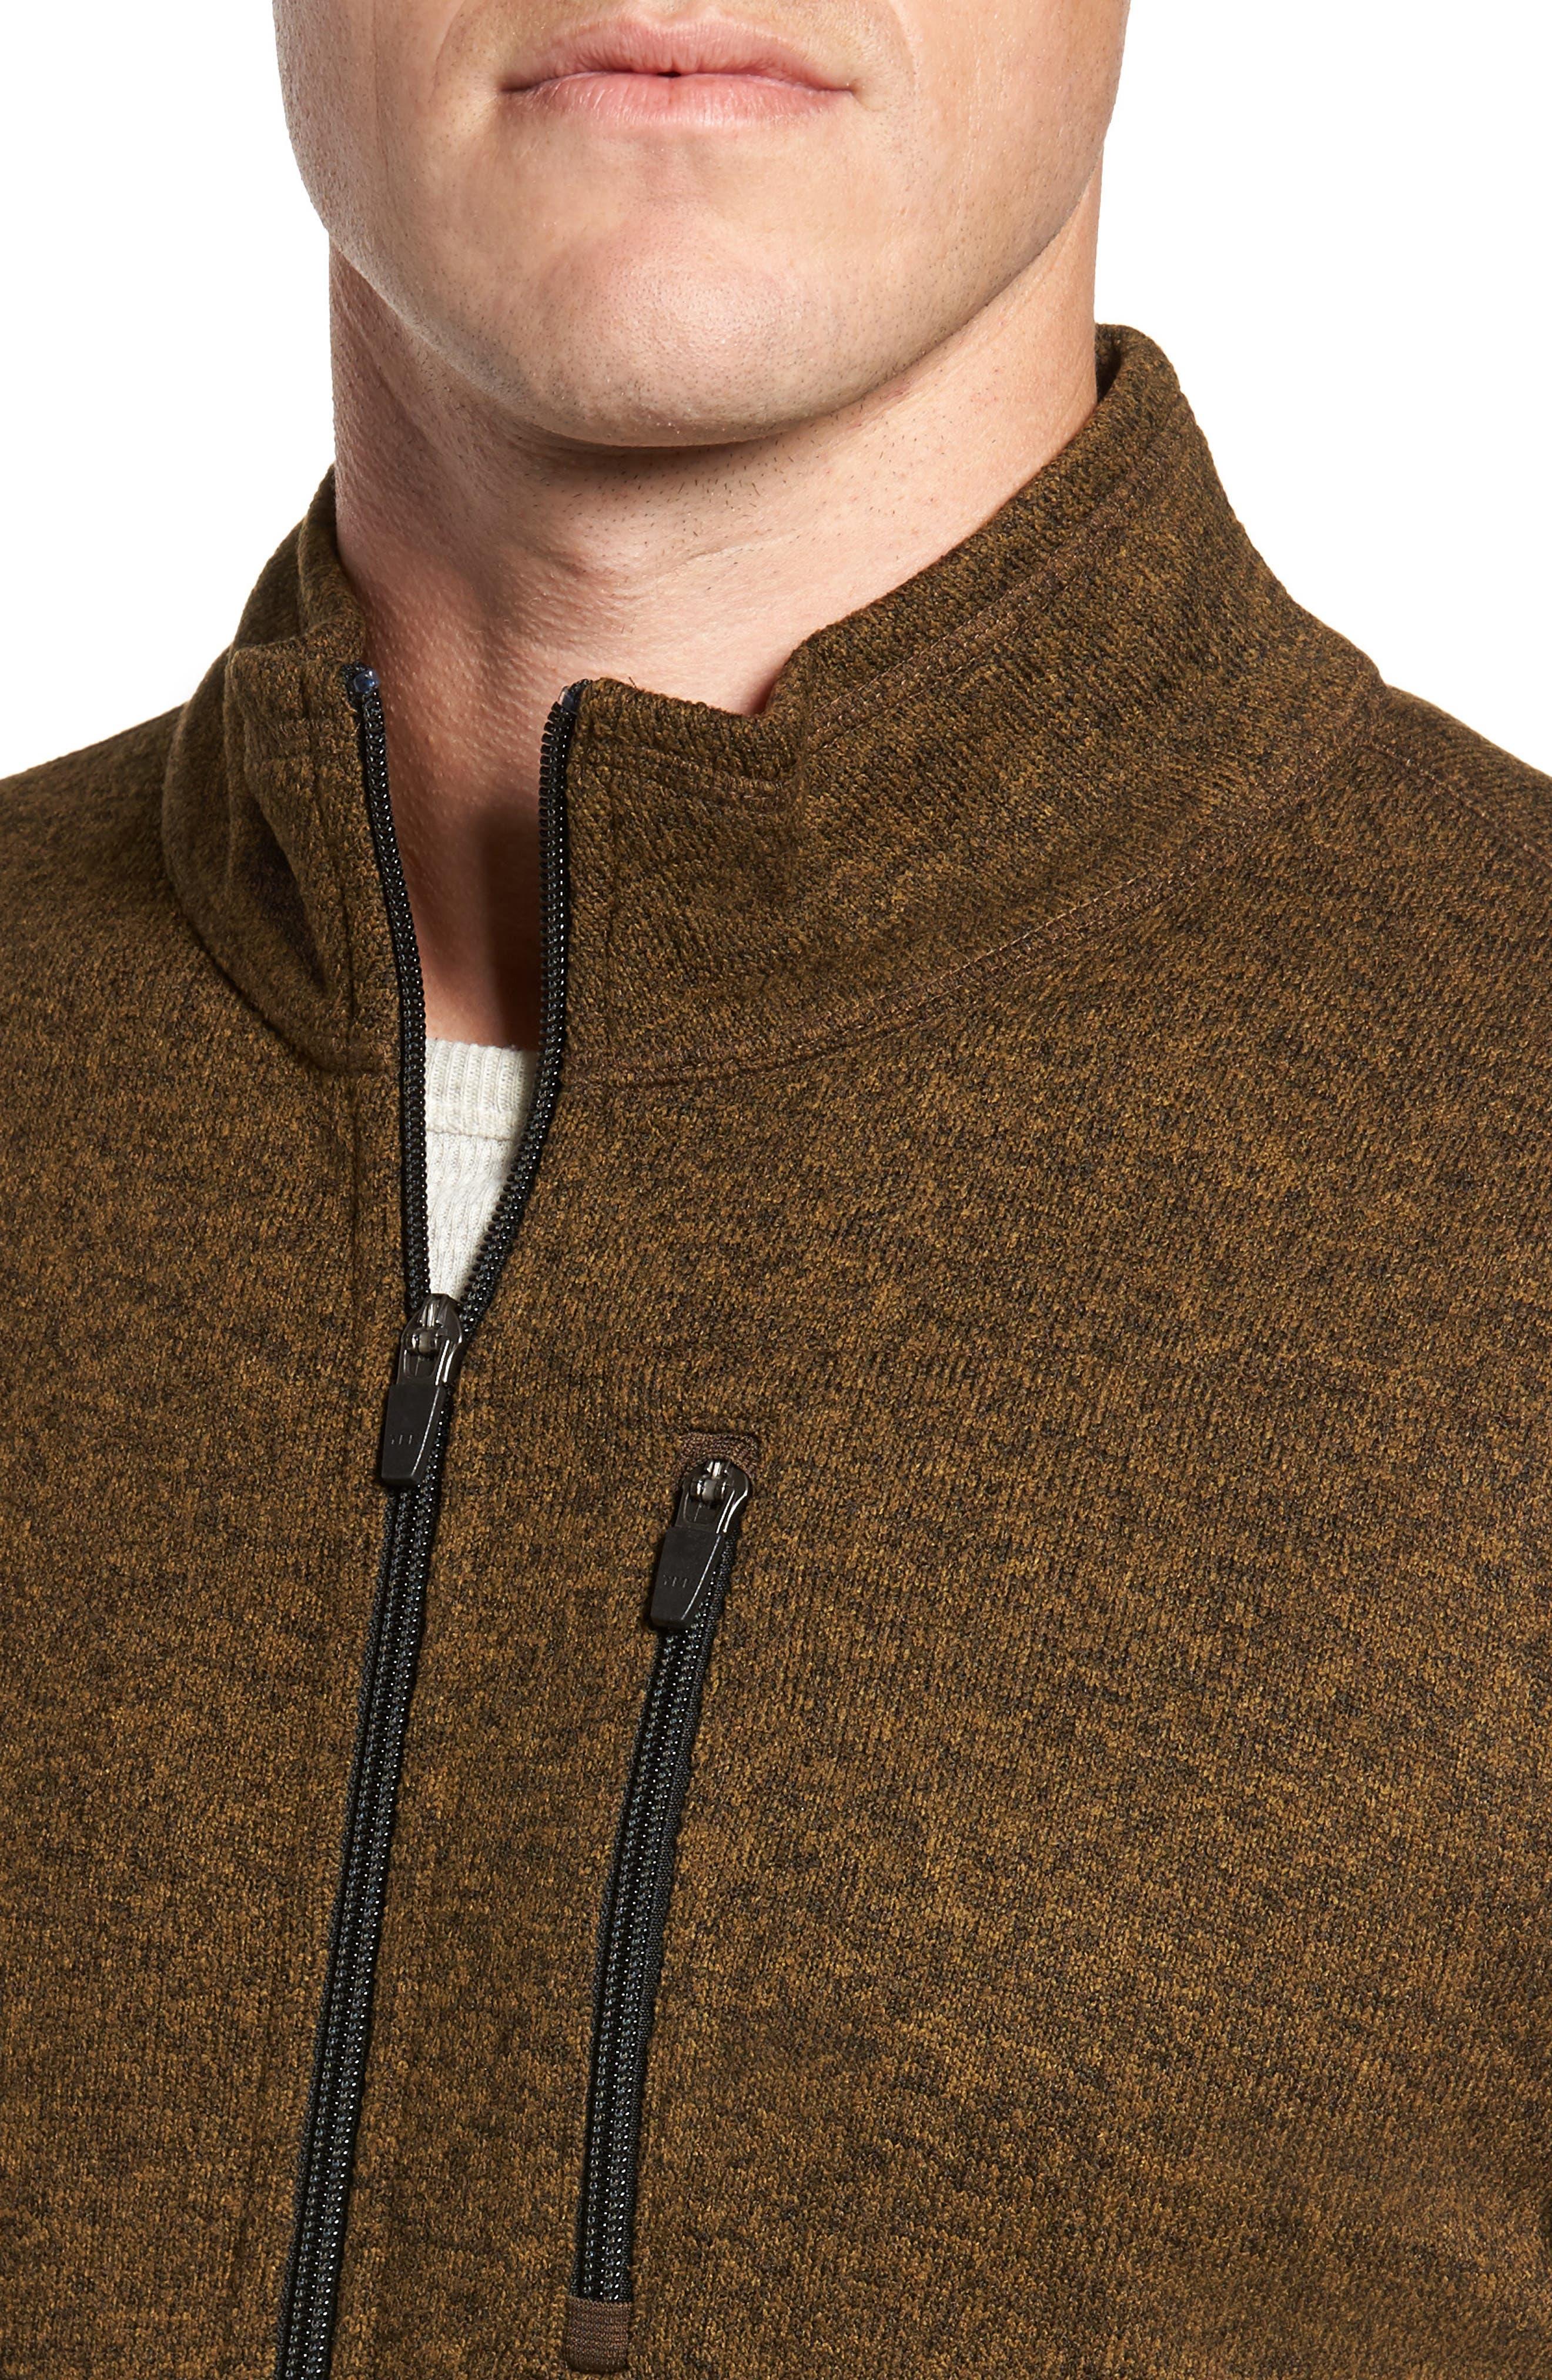 Sweater Knit Fleece Zip Front Jacket,                             Alternate thumbnail 11, color,